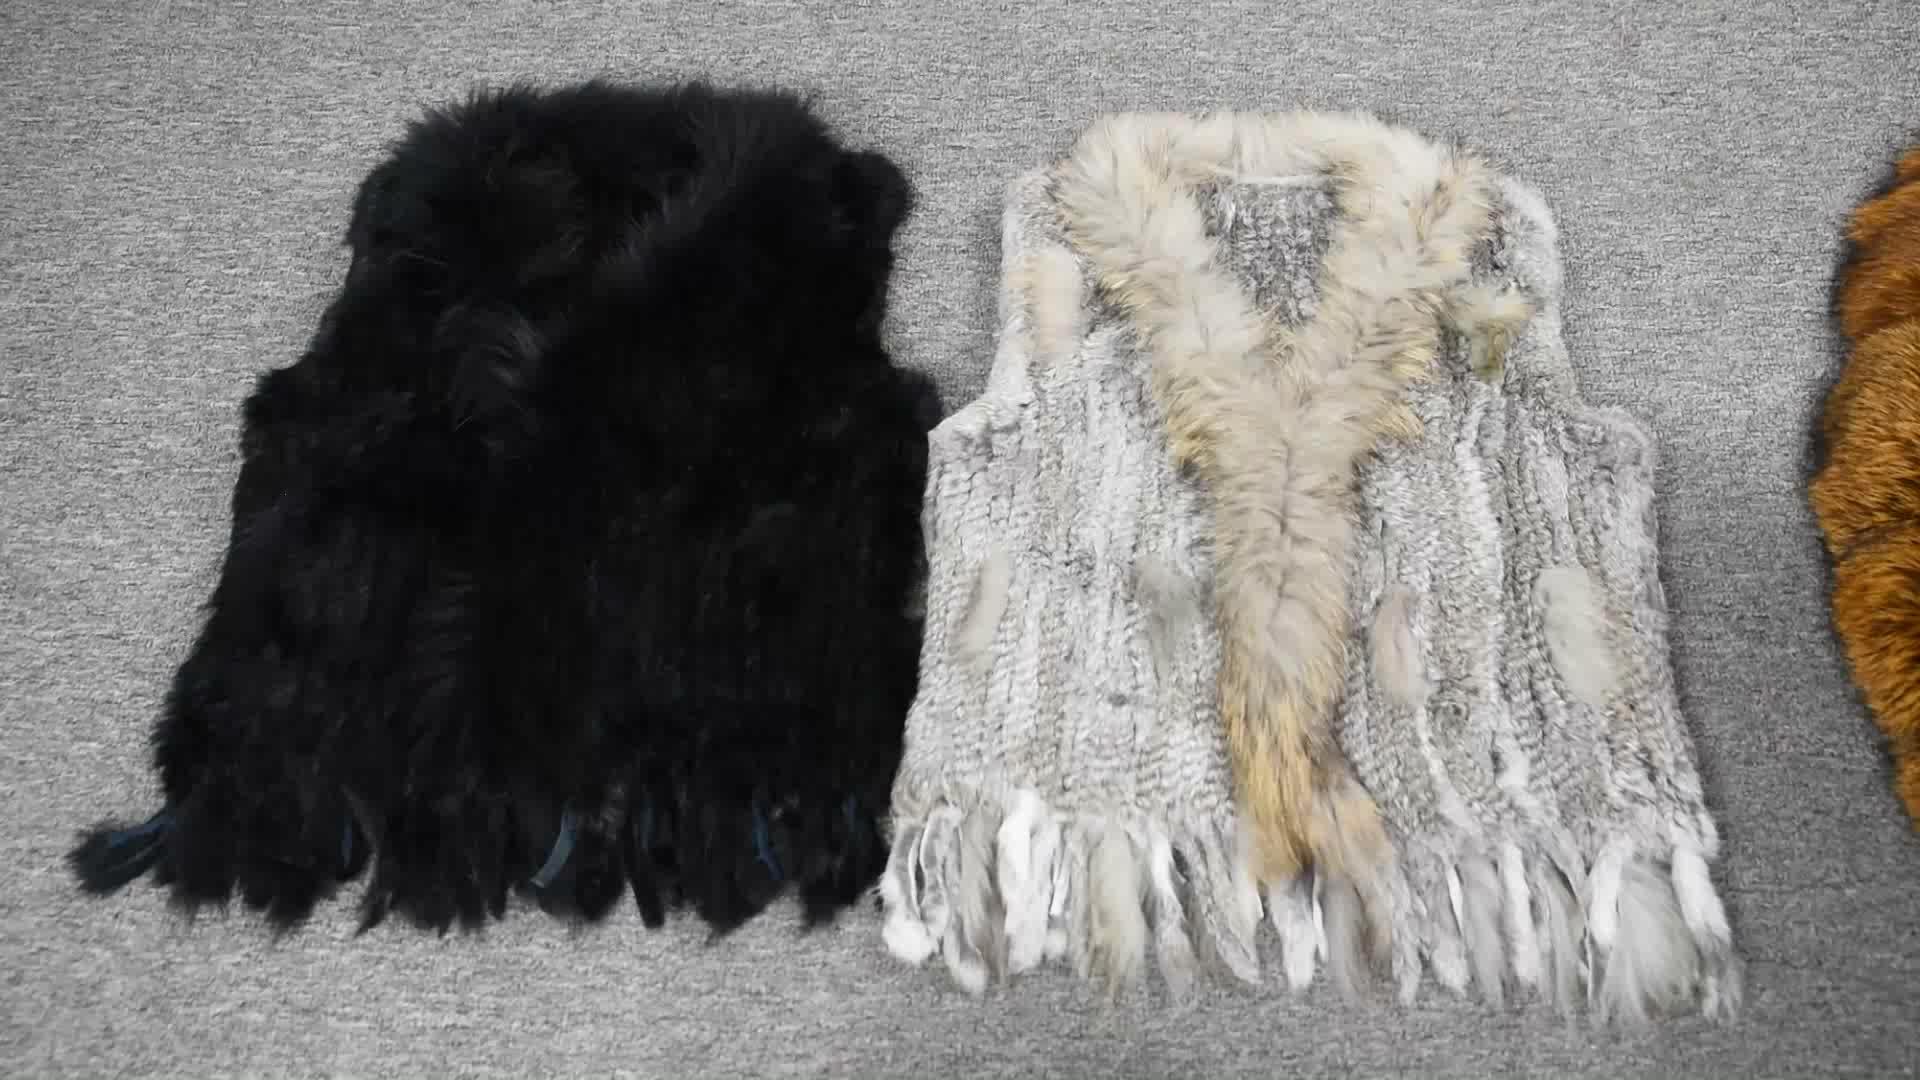 New Rabbit Real Fur Vest Raccoon Fur Collar Women Winter Fashion Gilet Waistcoat Ladies Coat